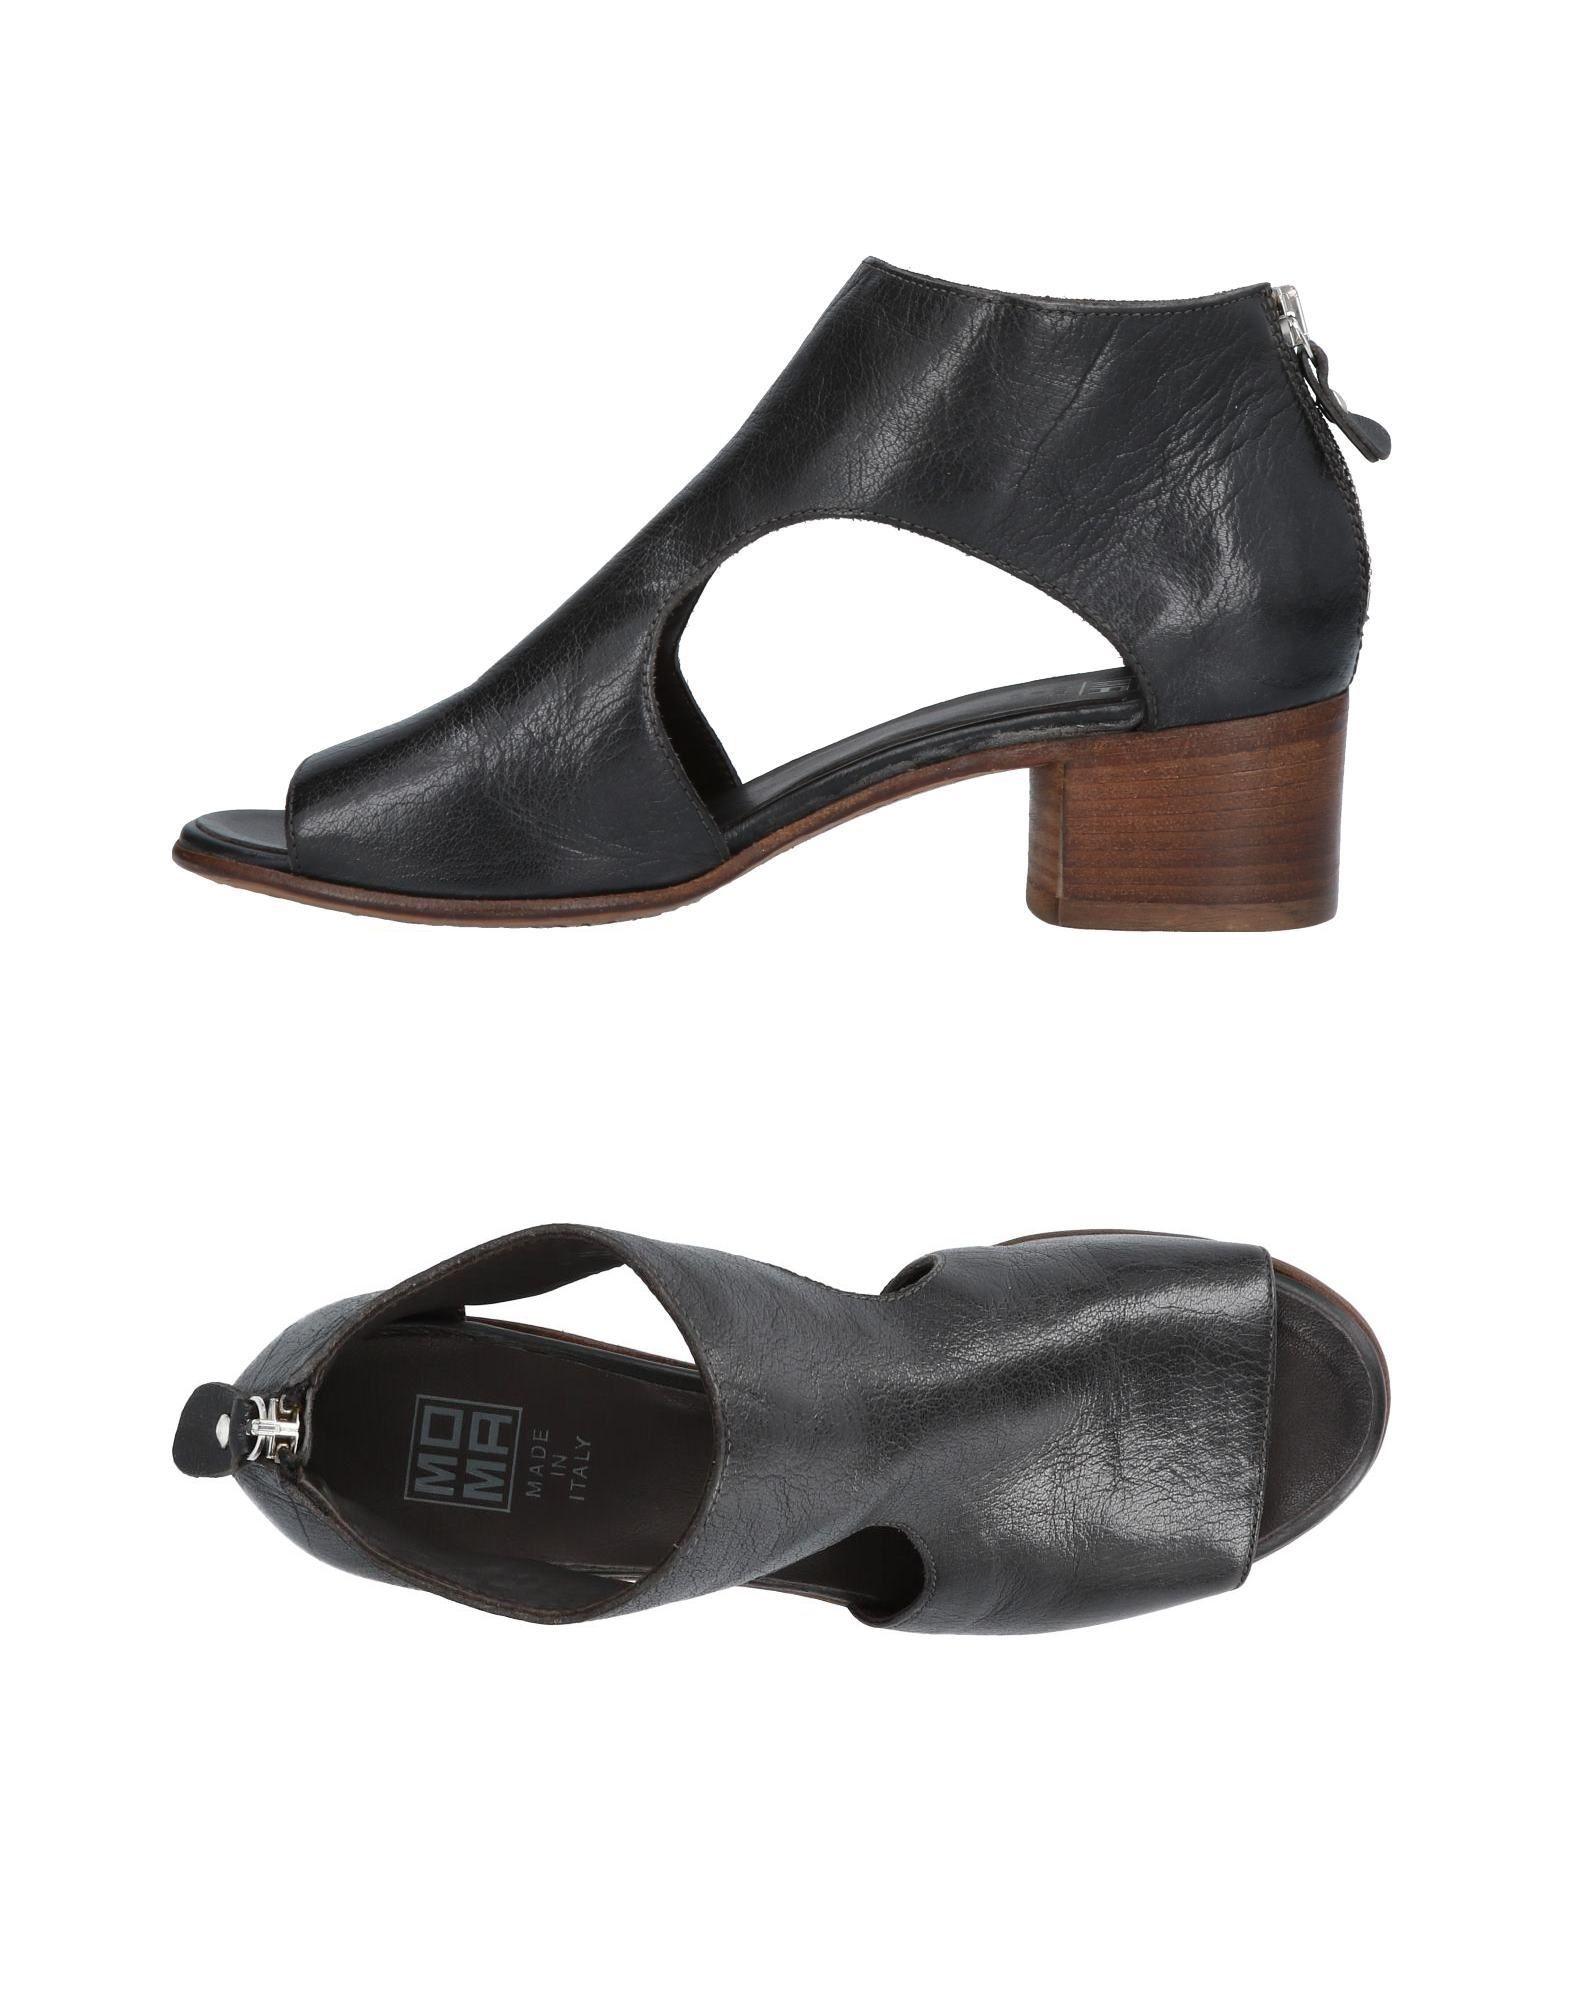 Moma Sandalen Damen  11420289WQGut aussehende strapazierfähige Schuhe